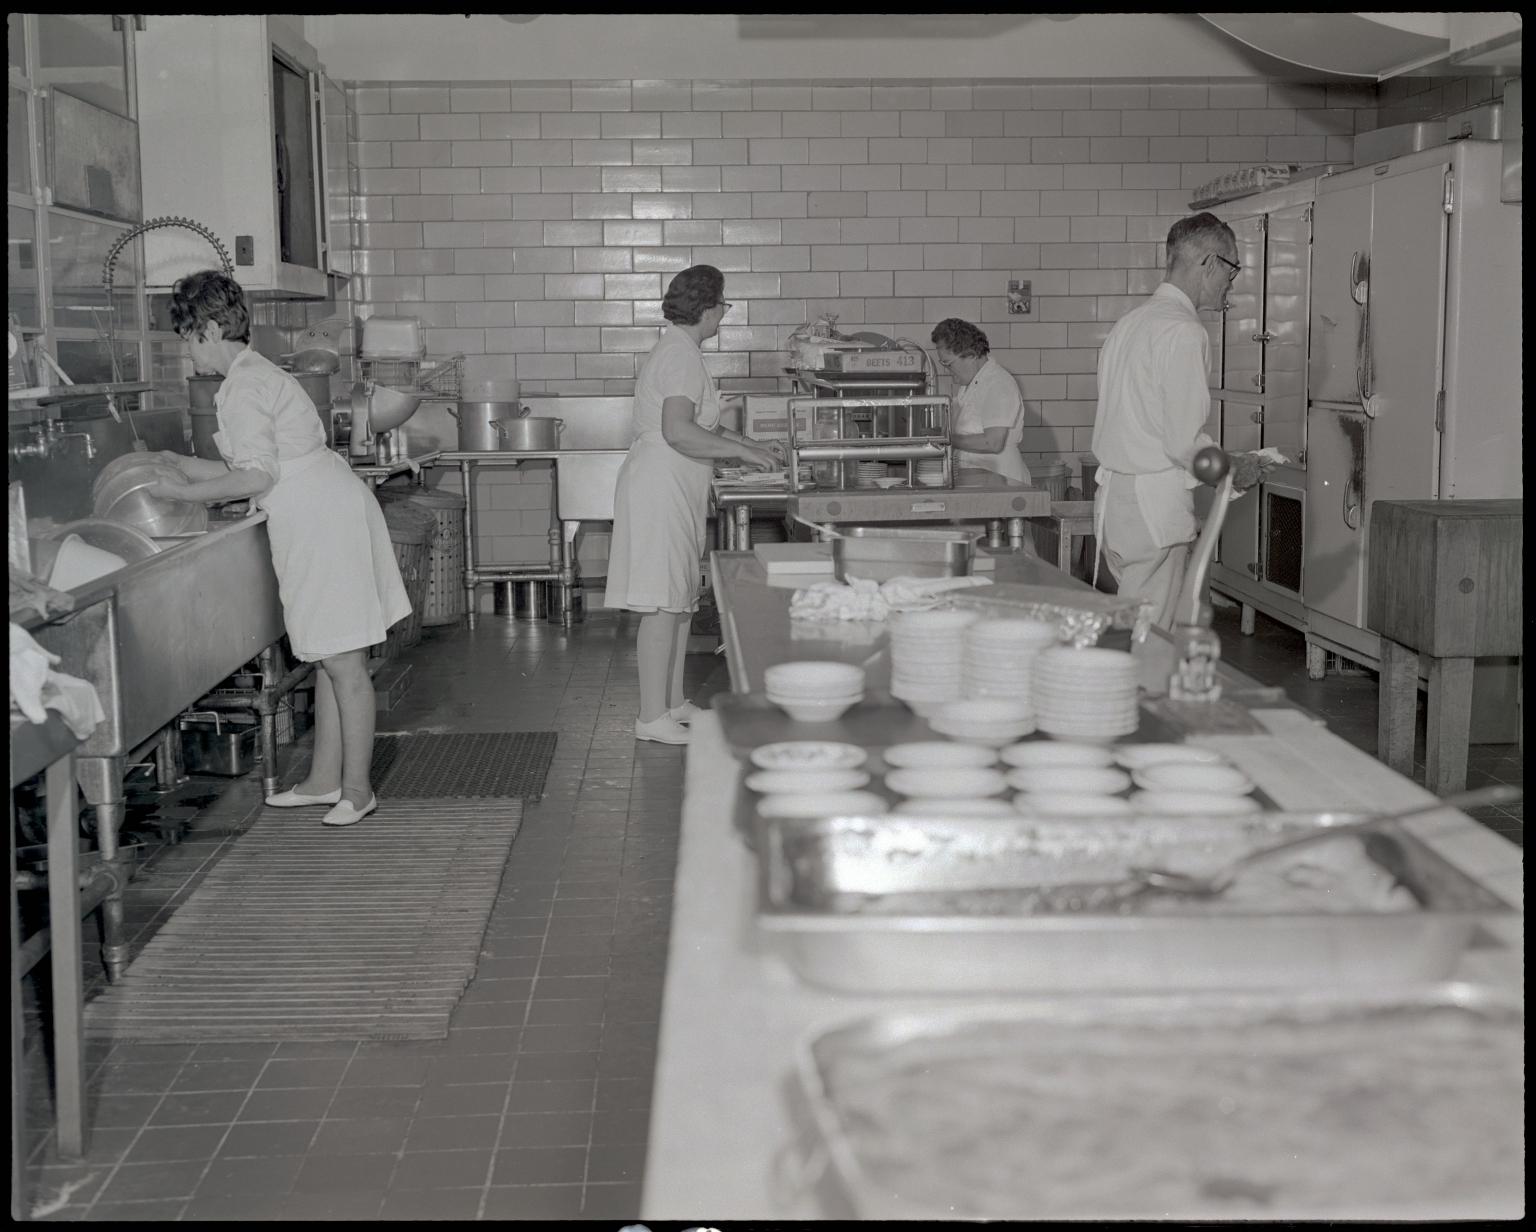 Hospital Kitchen